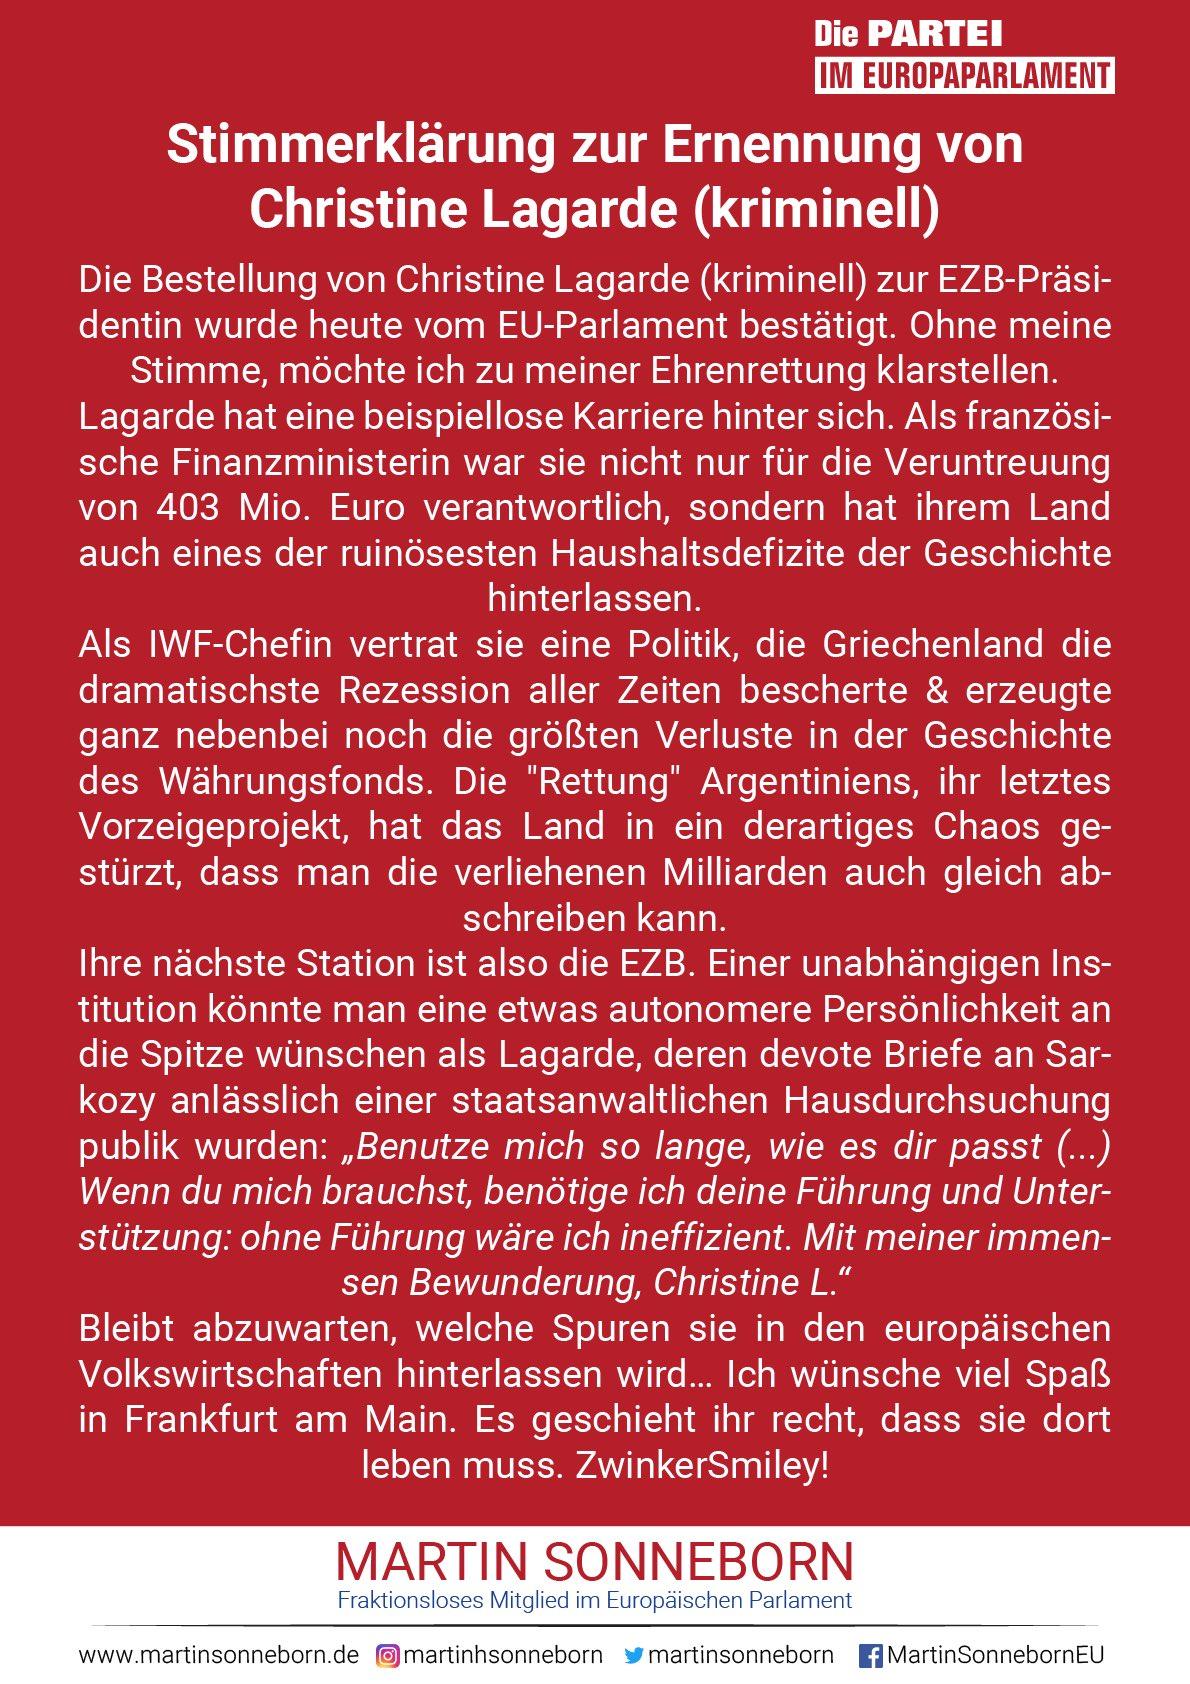 Benutze-mich-so-lange-wie-es-dir-passt-Kommentar-Oliver-Baron-GodmodeTrader.de-1